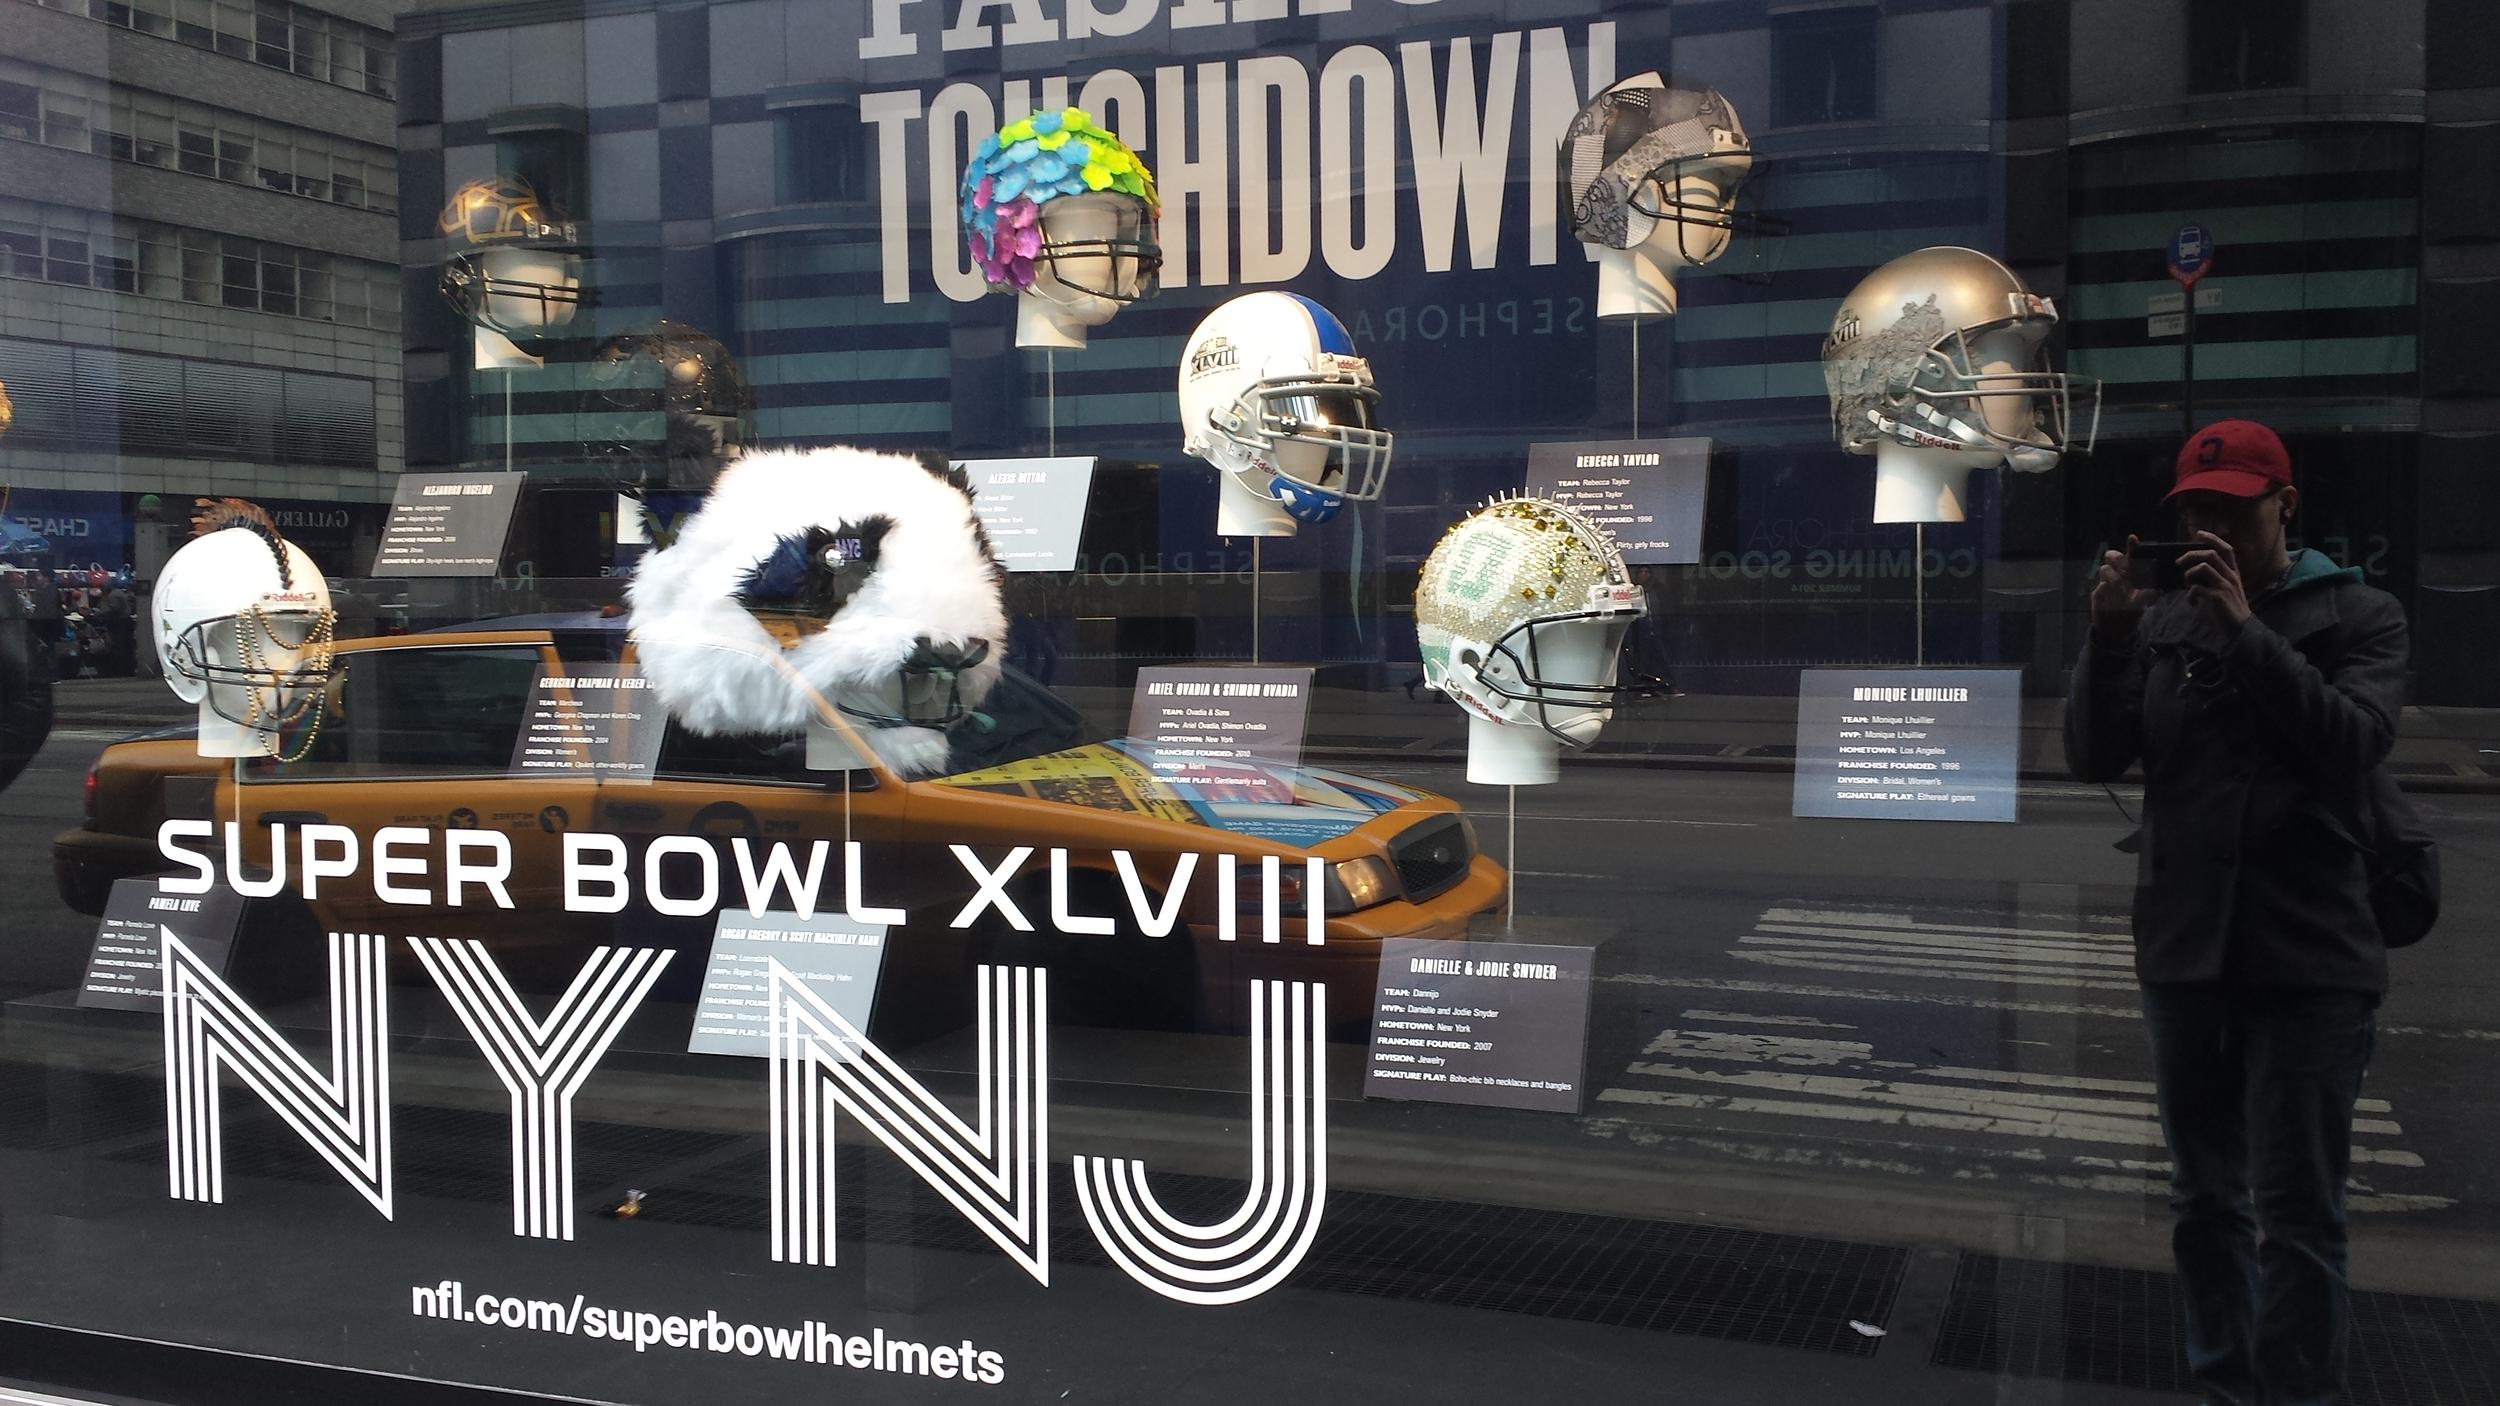 Bloomingdale's Super Bowl display